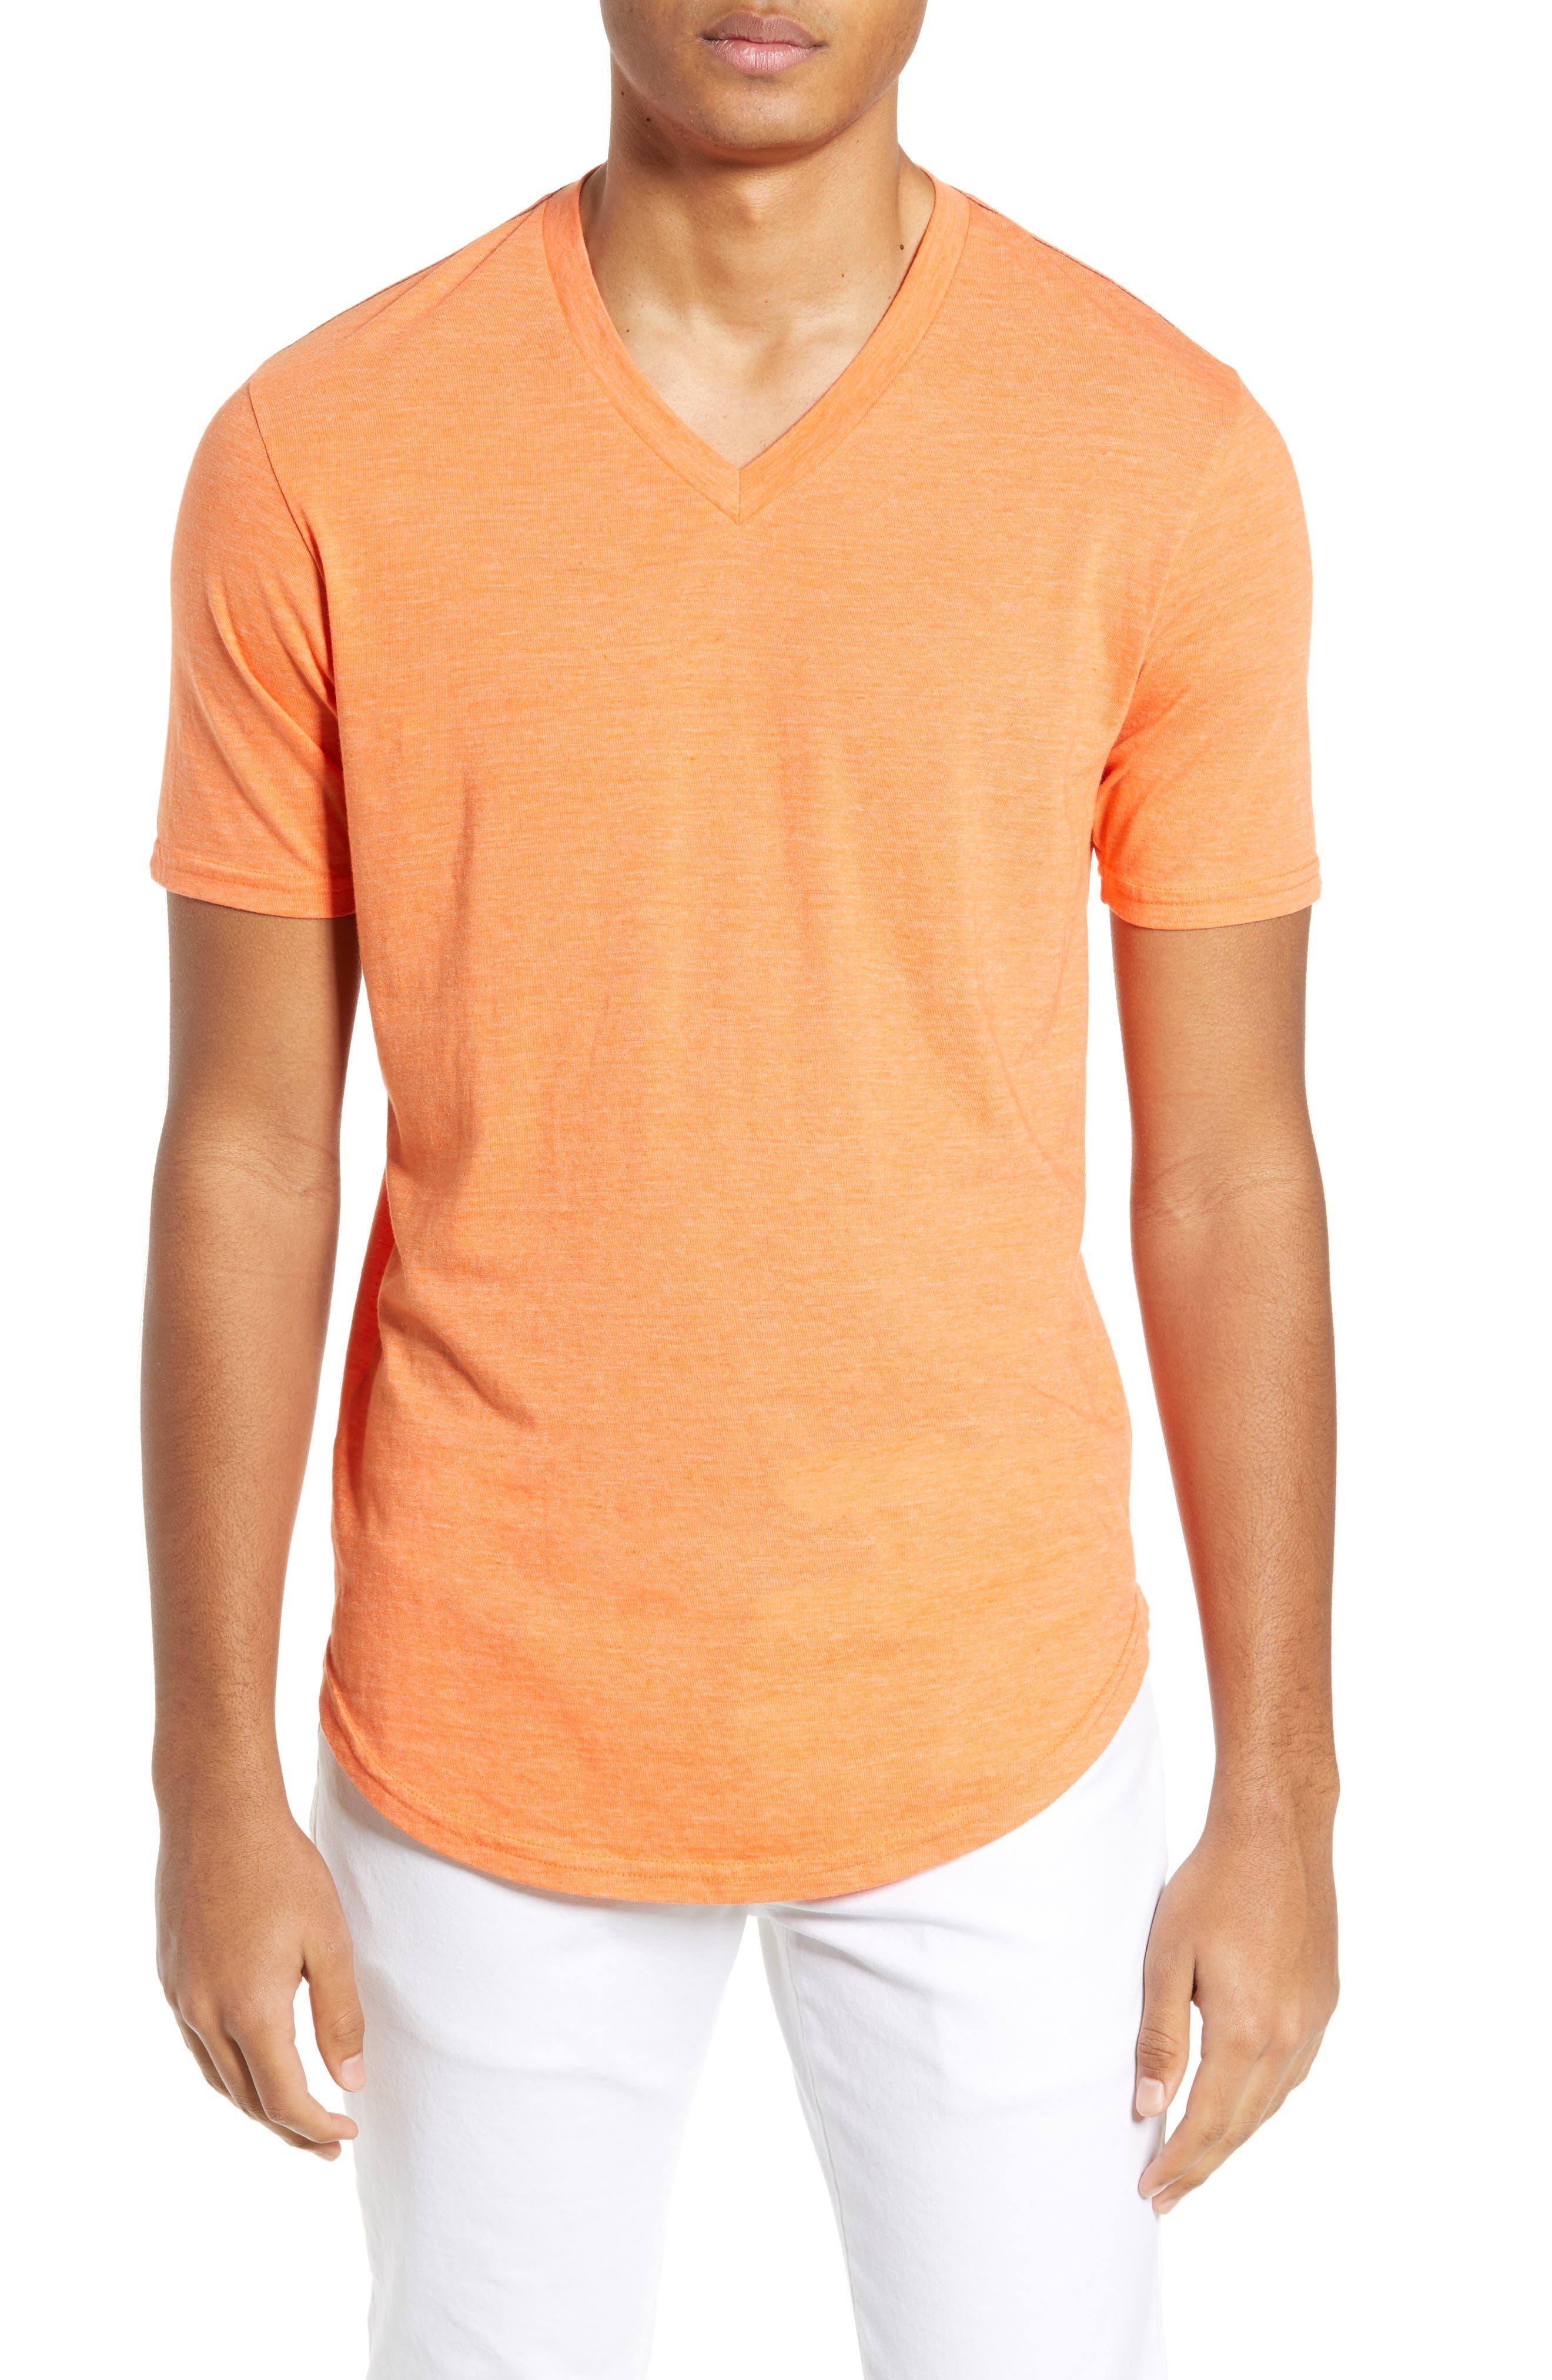 7c459887 Men's Goodlife Clothing | Nordstrom